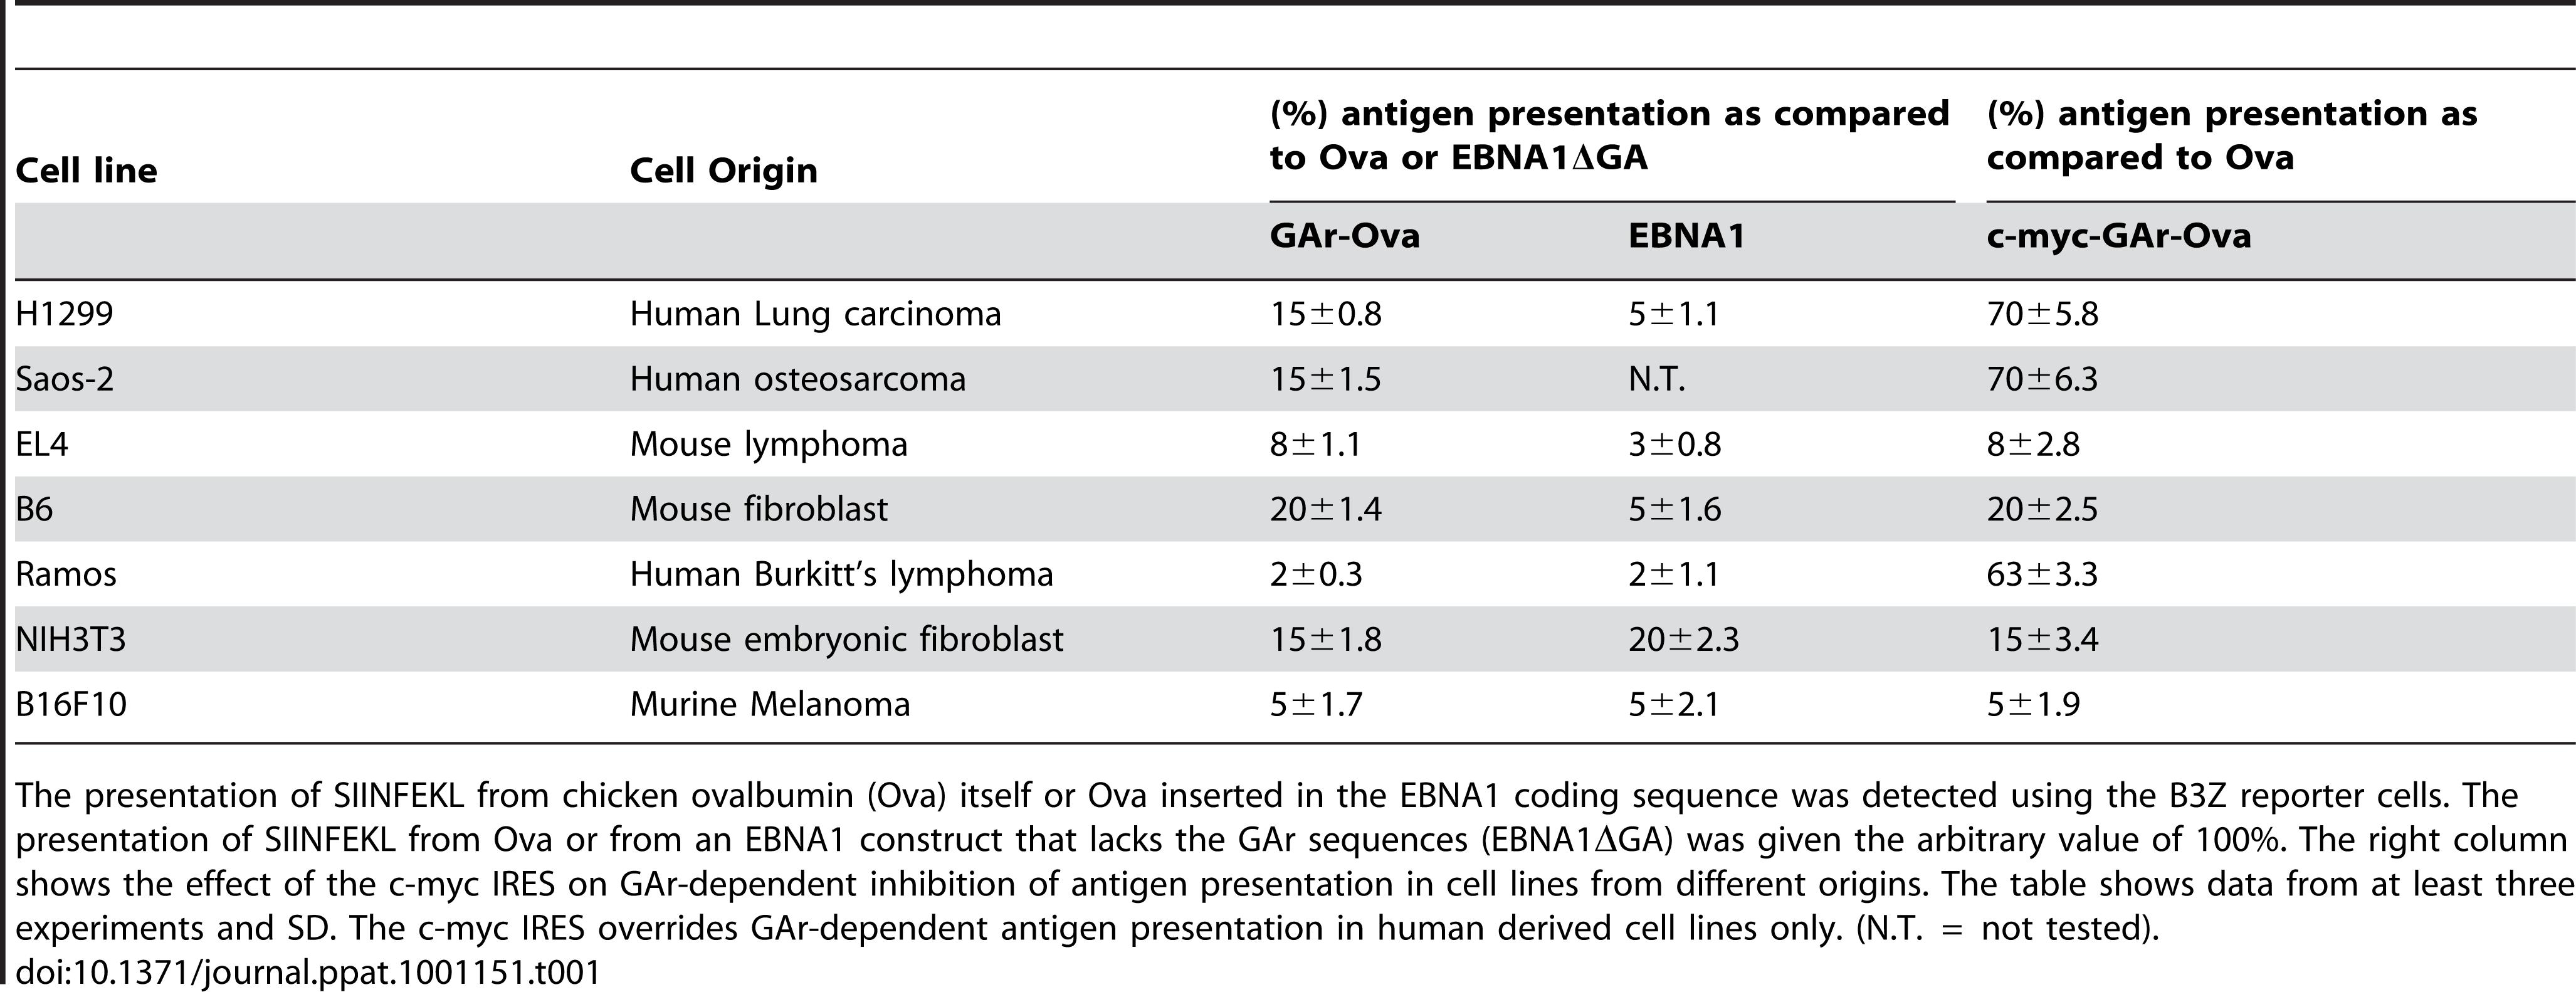 GAr-dependent inhibition of antigen presentation in different cell lines from different origins.